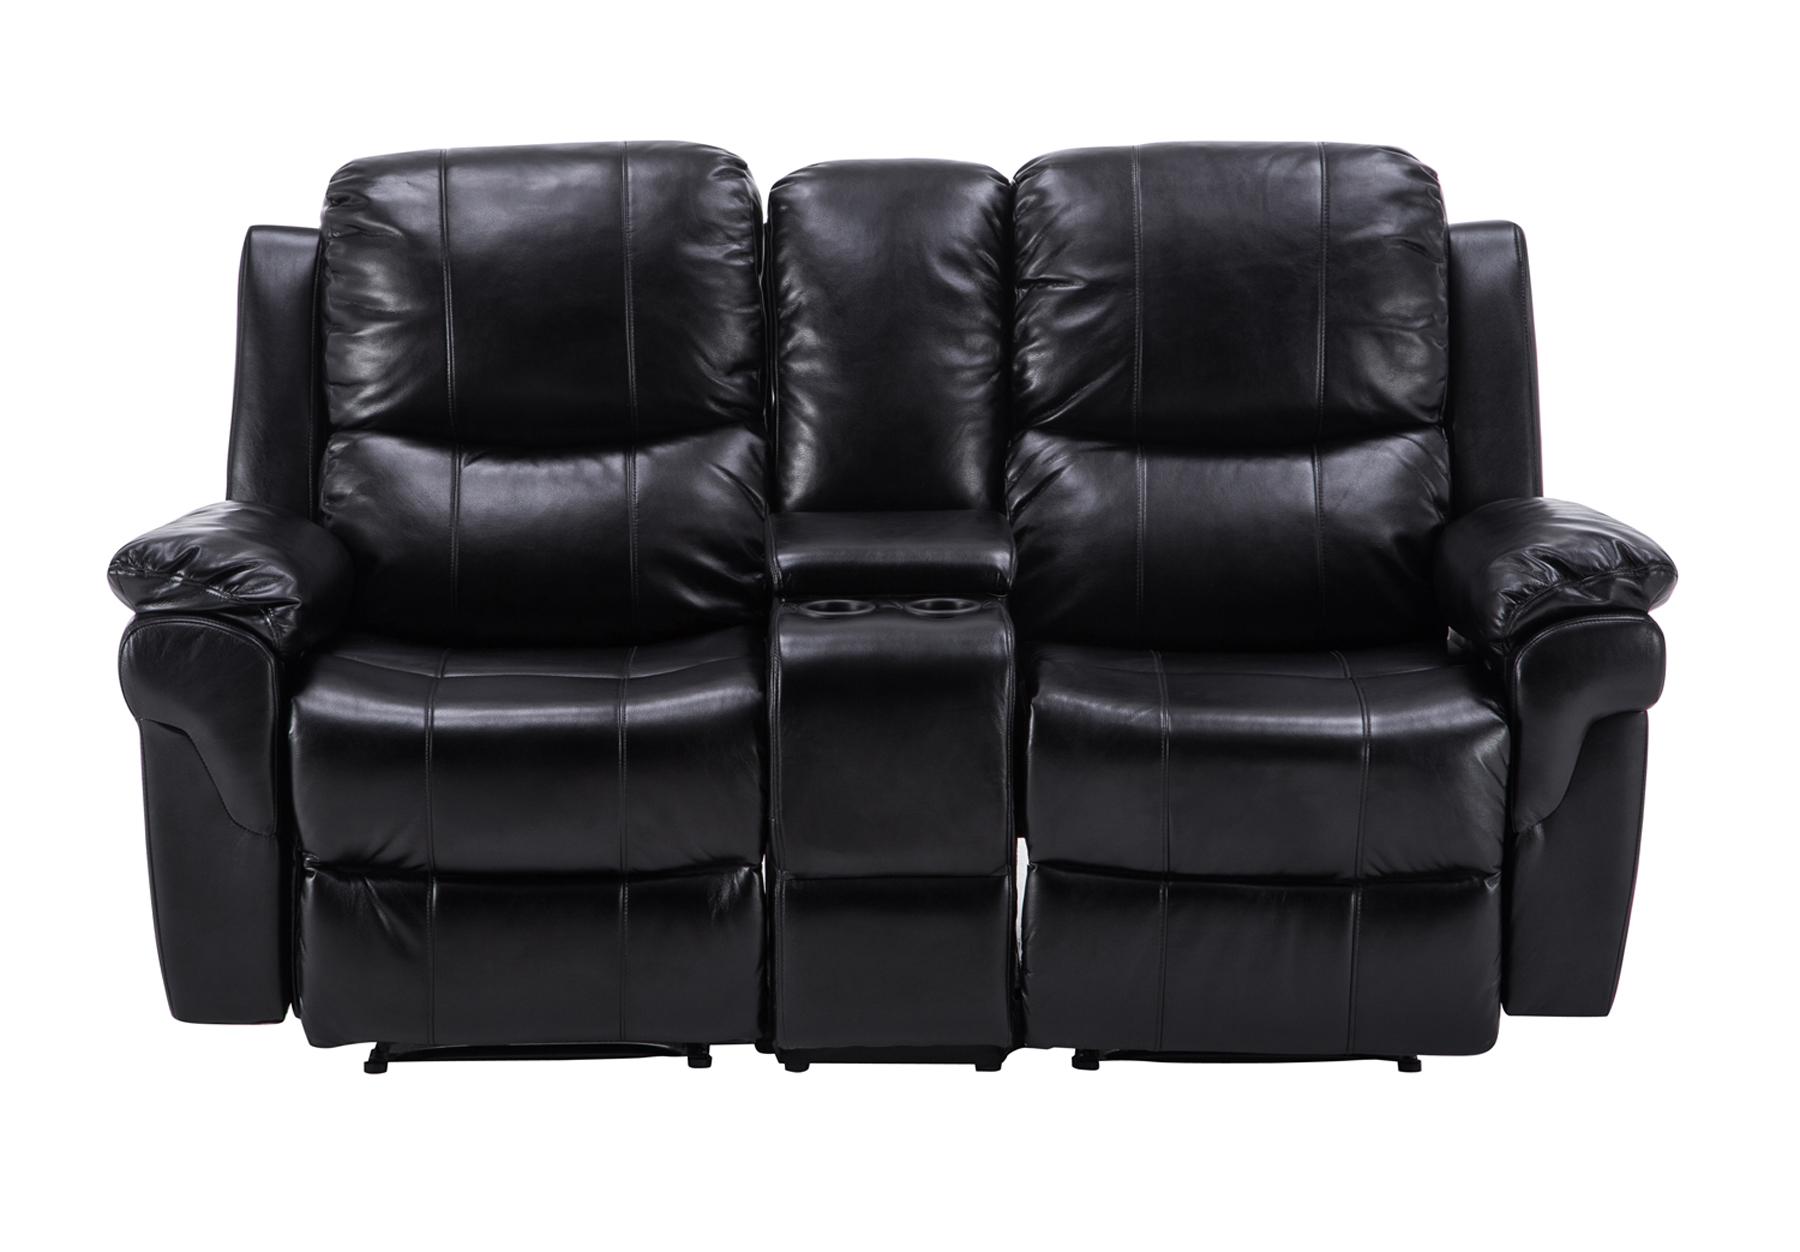 mcombo kinosessel fernsehsessel relaxsessel 2 sitzer heimkino cinema sessel sofa ebay. Black Bedroom Furniture Sets. Home Design Ideas